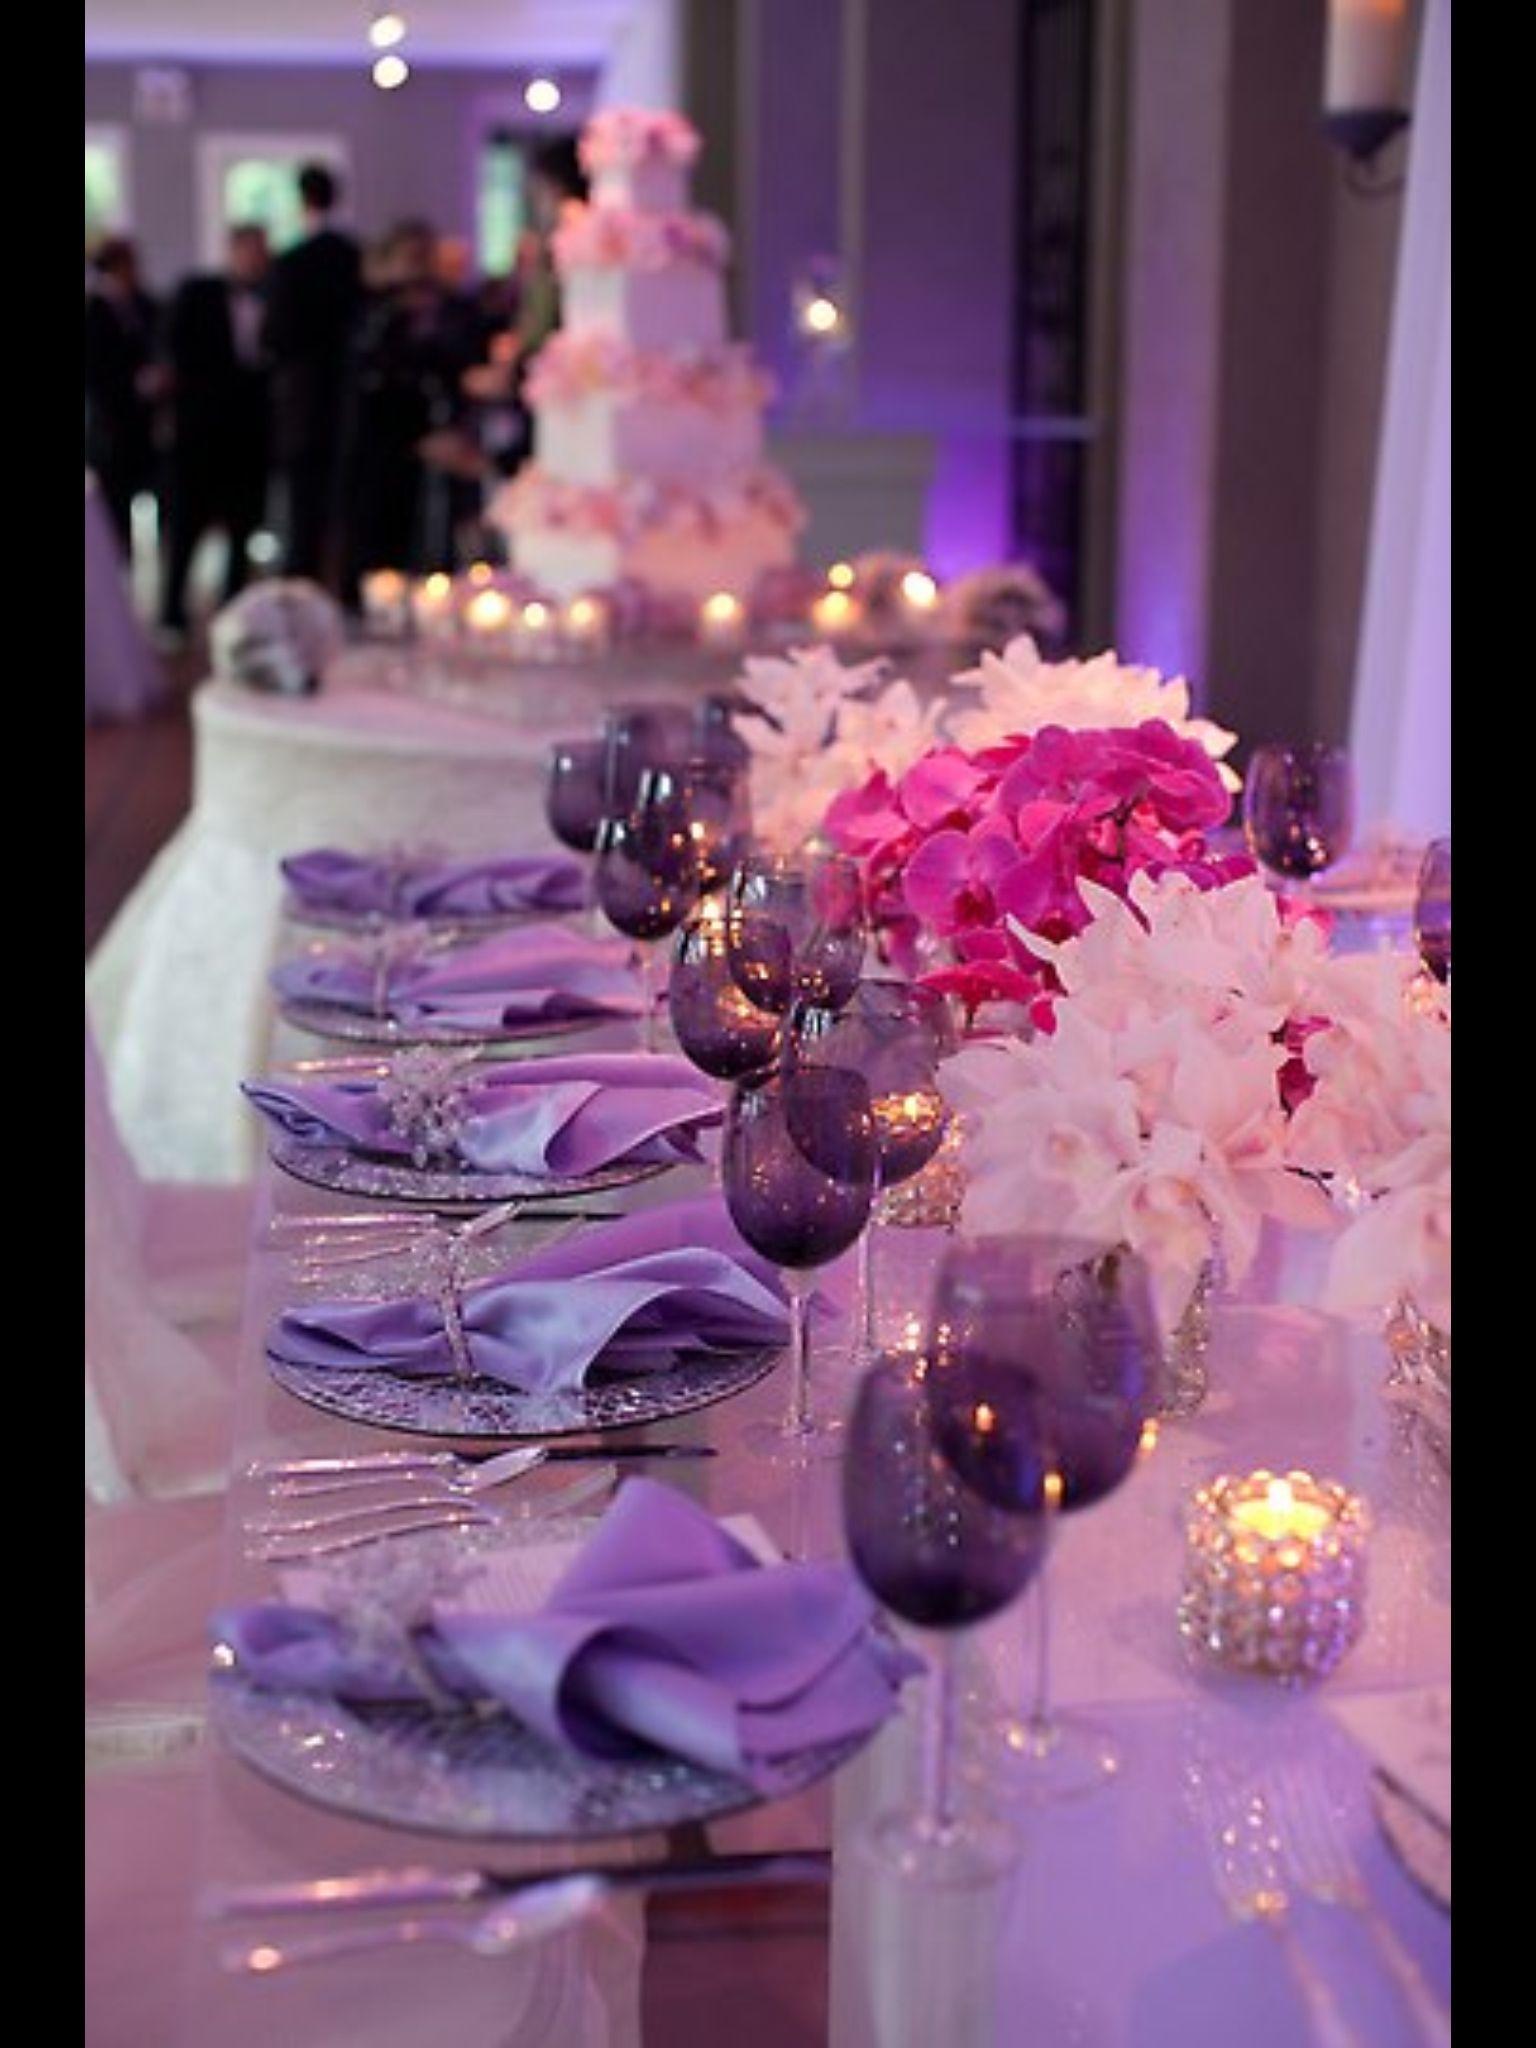 Wedding decoration ideas purple  Purplelilac wedding  BODAS EN VIOLETA  Pinterest  Purple lilac